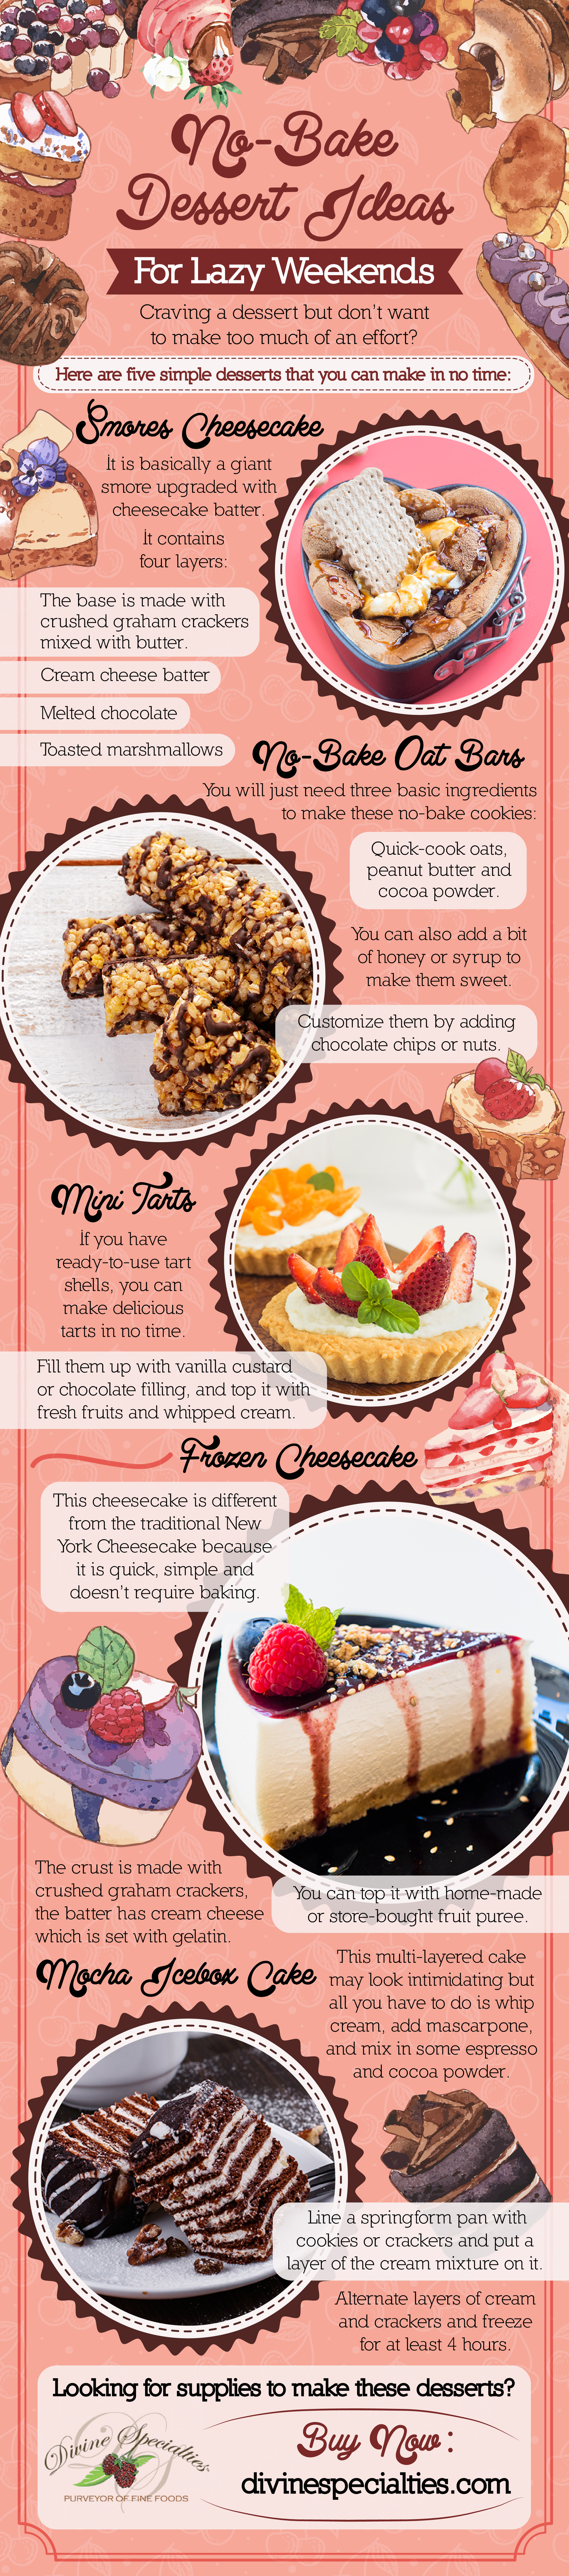 No-Bake Dessert Ideas